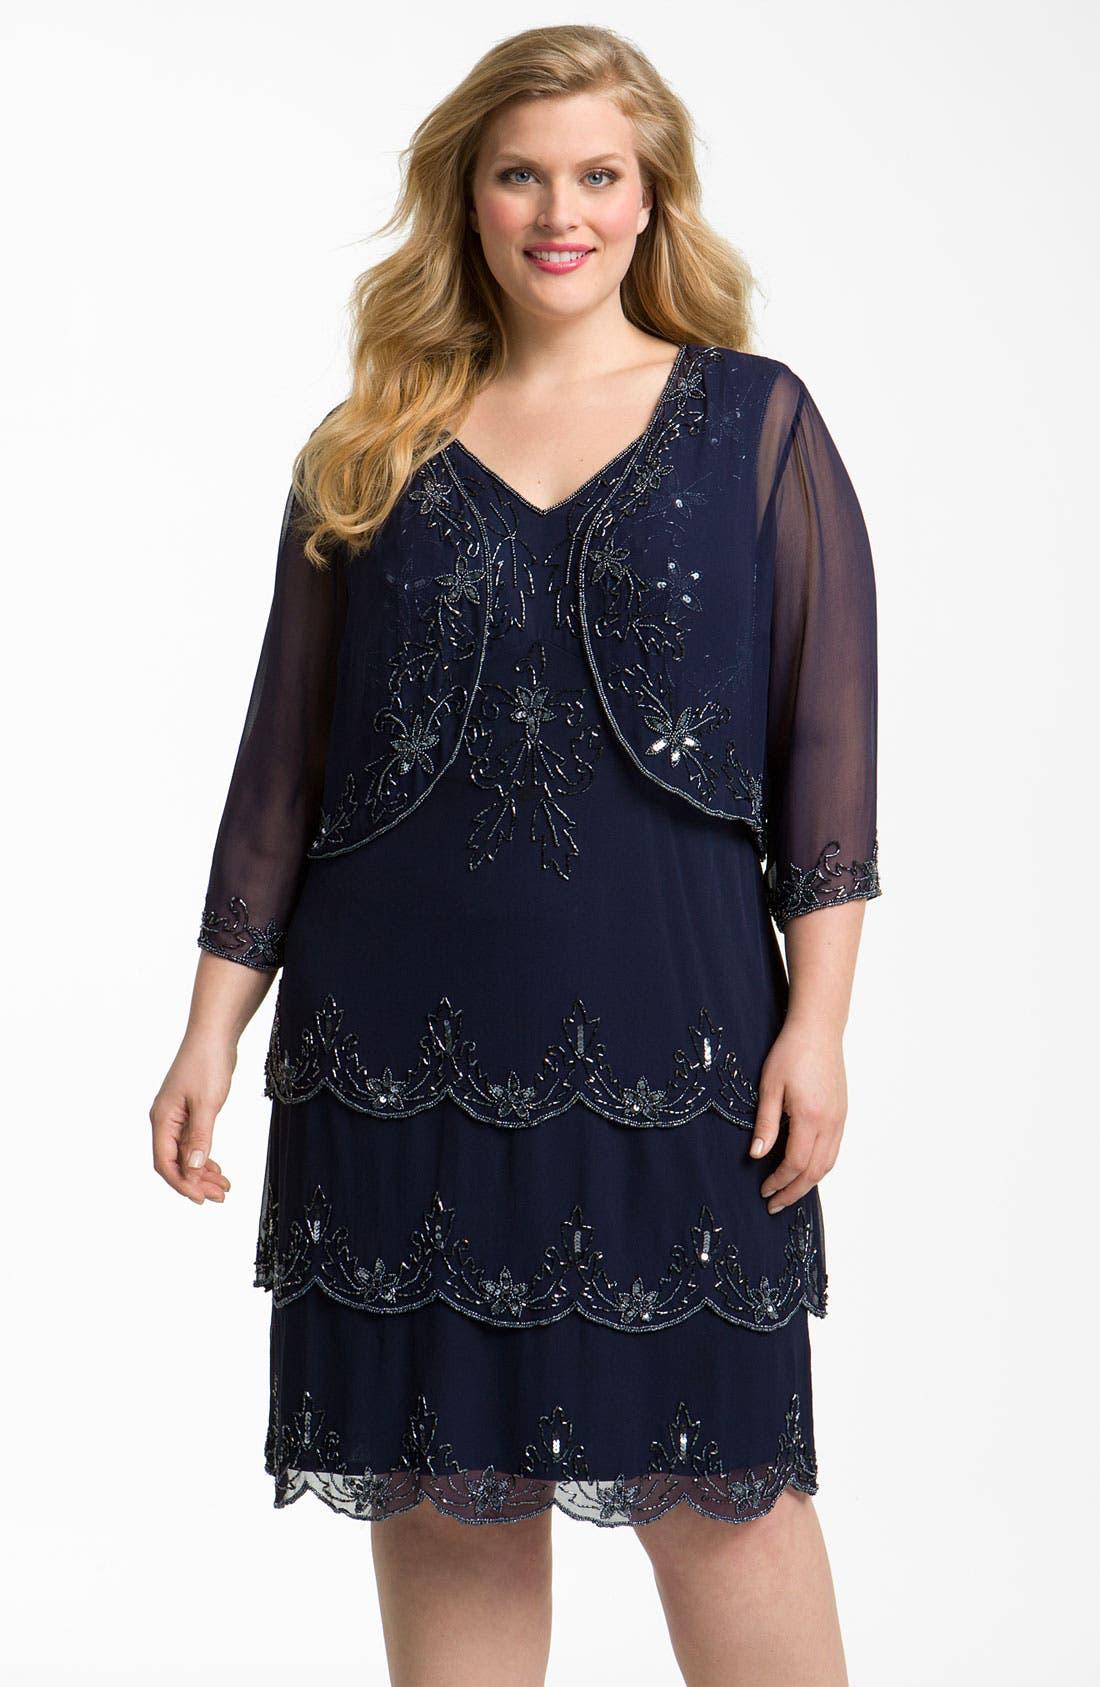 Alternate Image 1 Selected - Pisarro Nights Beaded Silk Dress & Jacket (Plus)